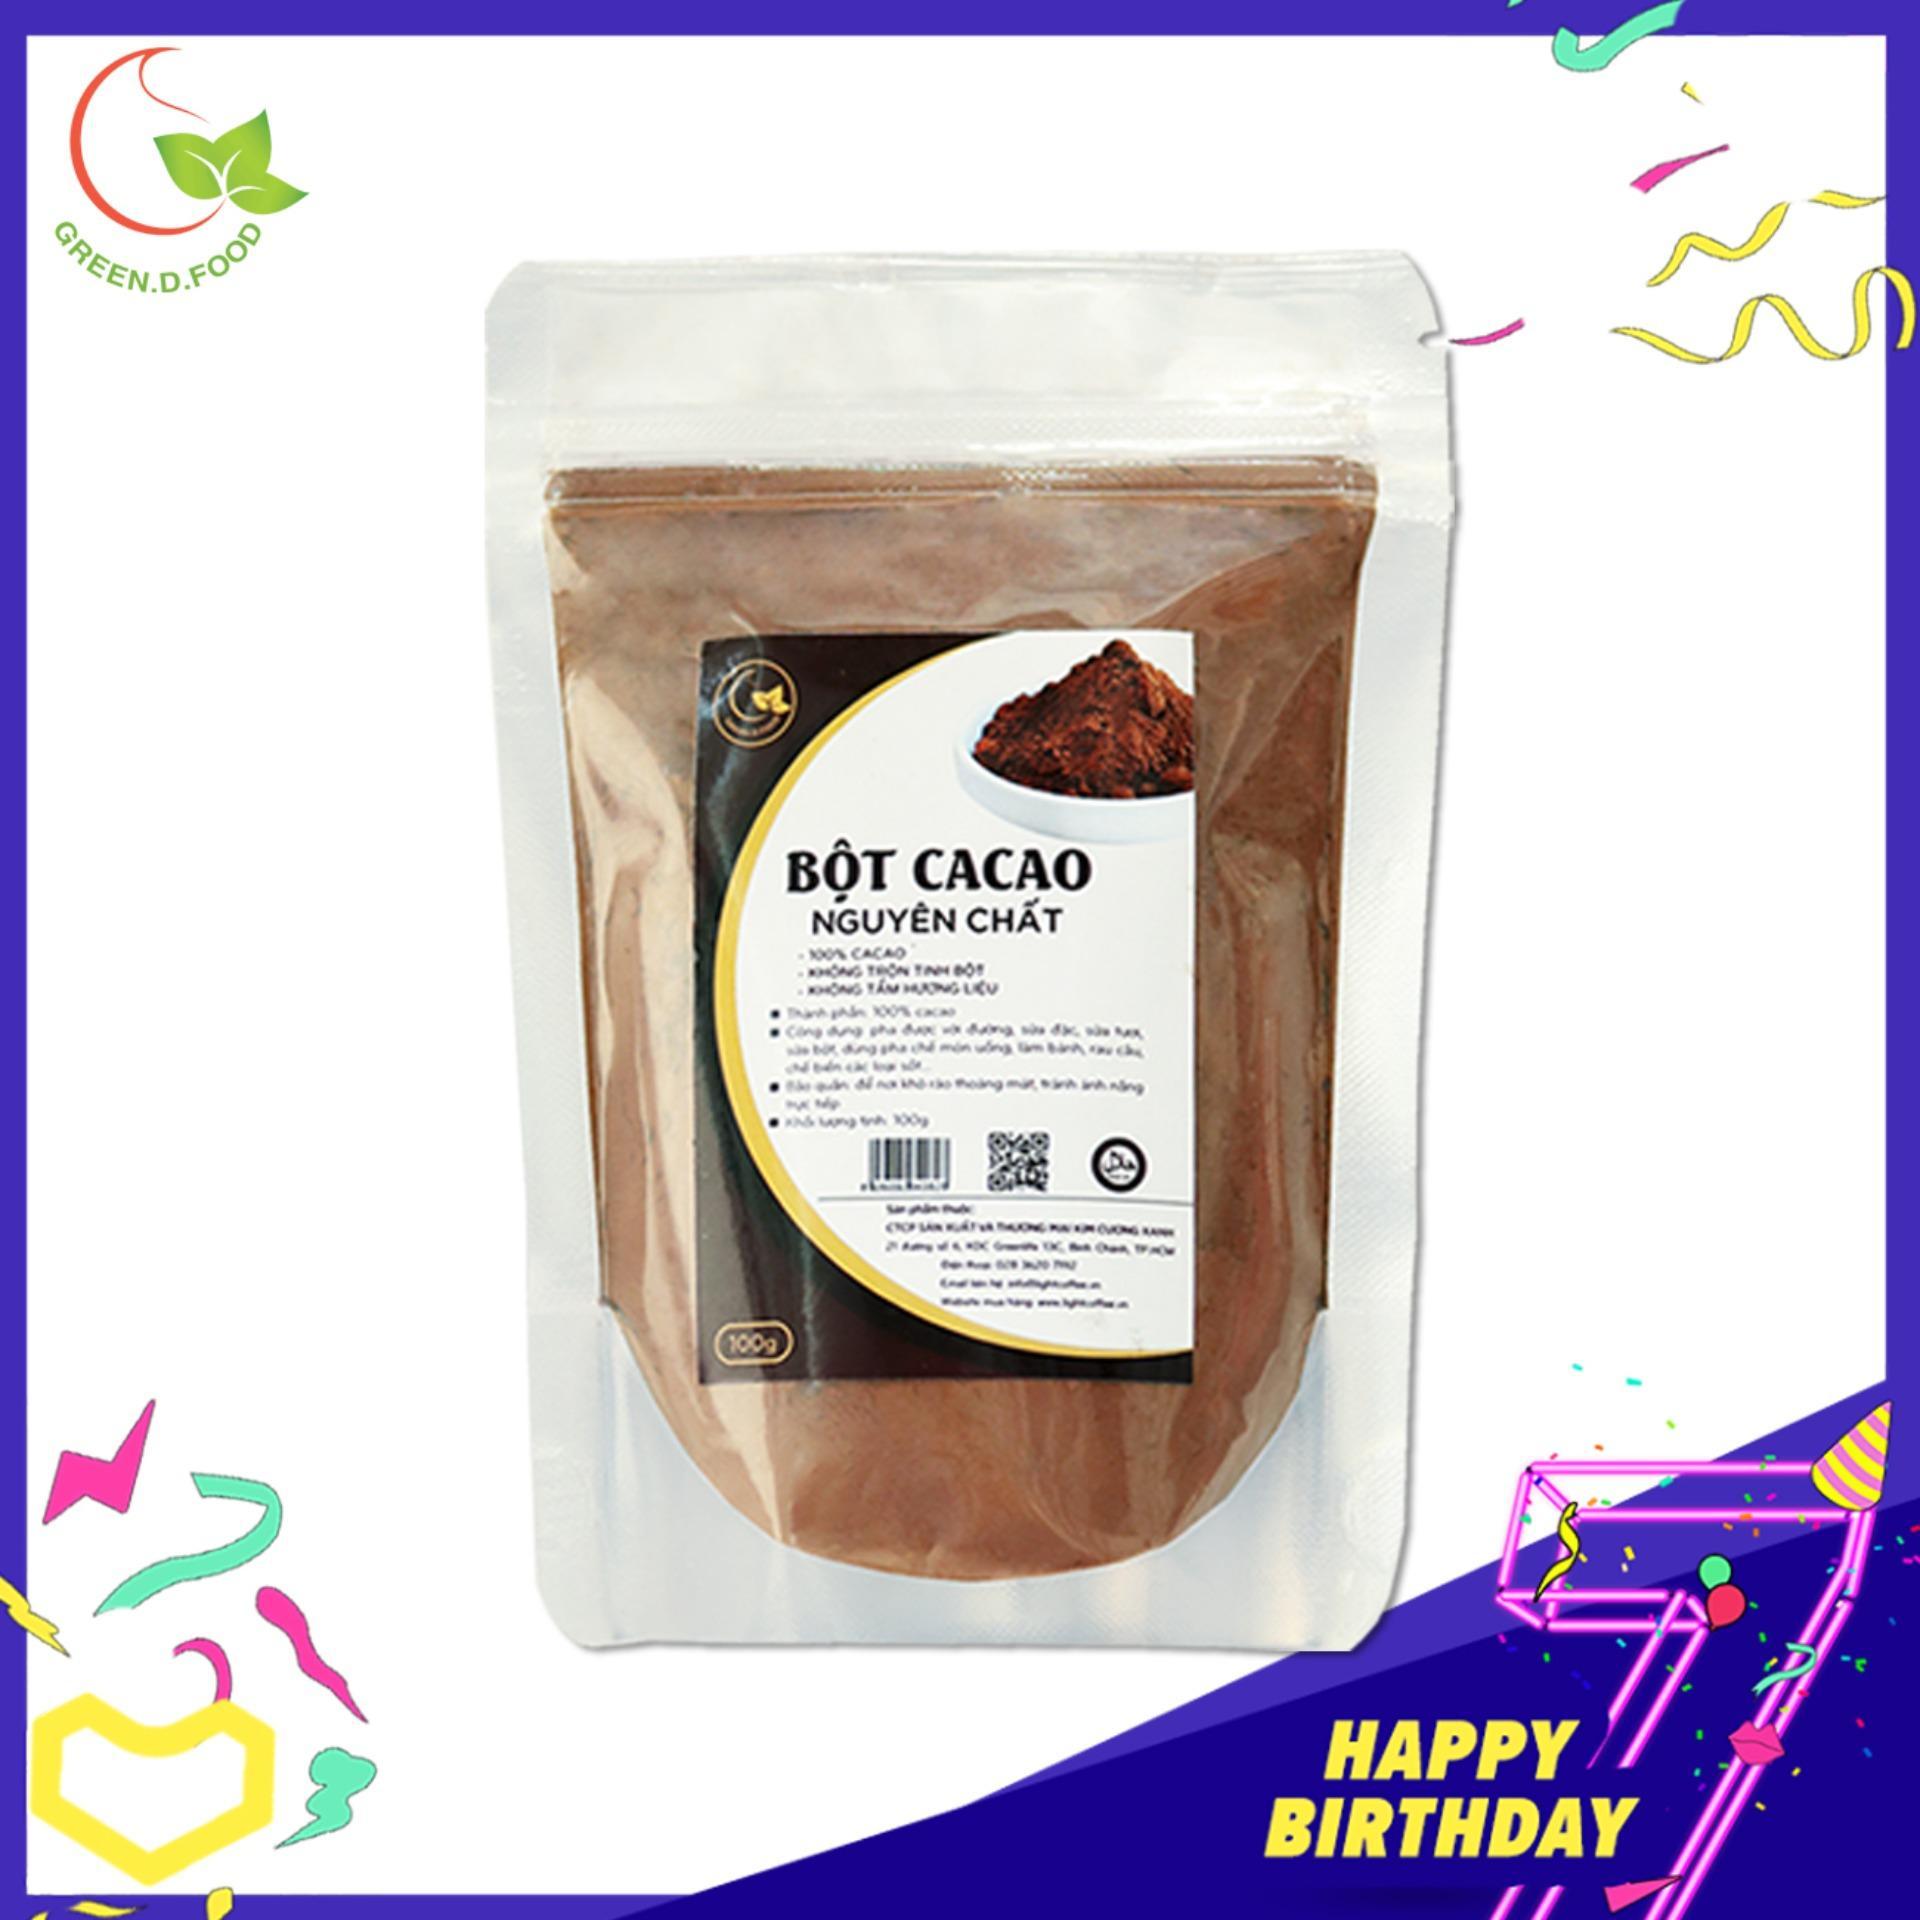 Cacao nguyên chất 100% - Light Ca cao - 100gr